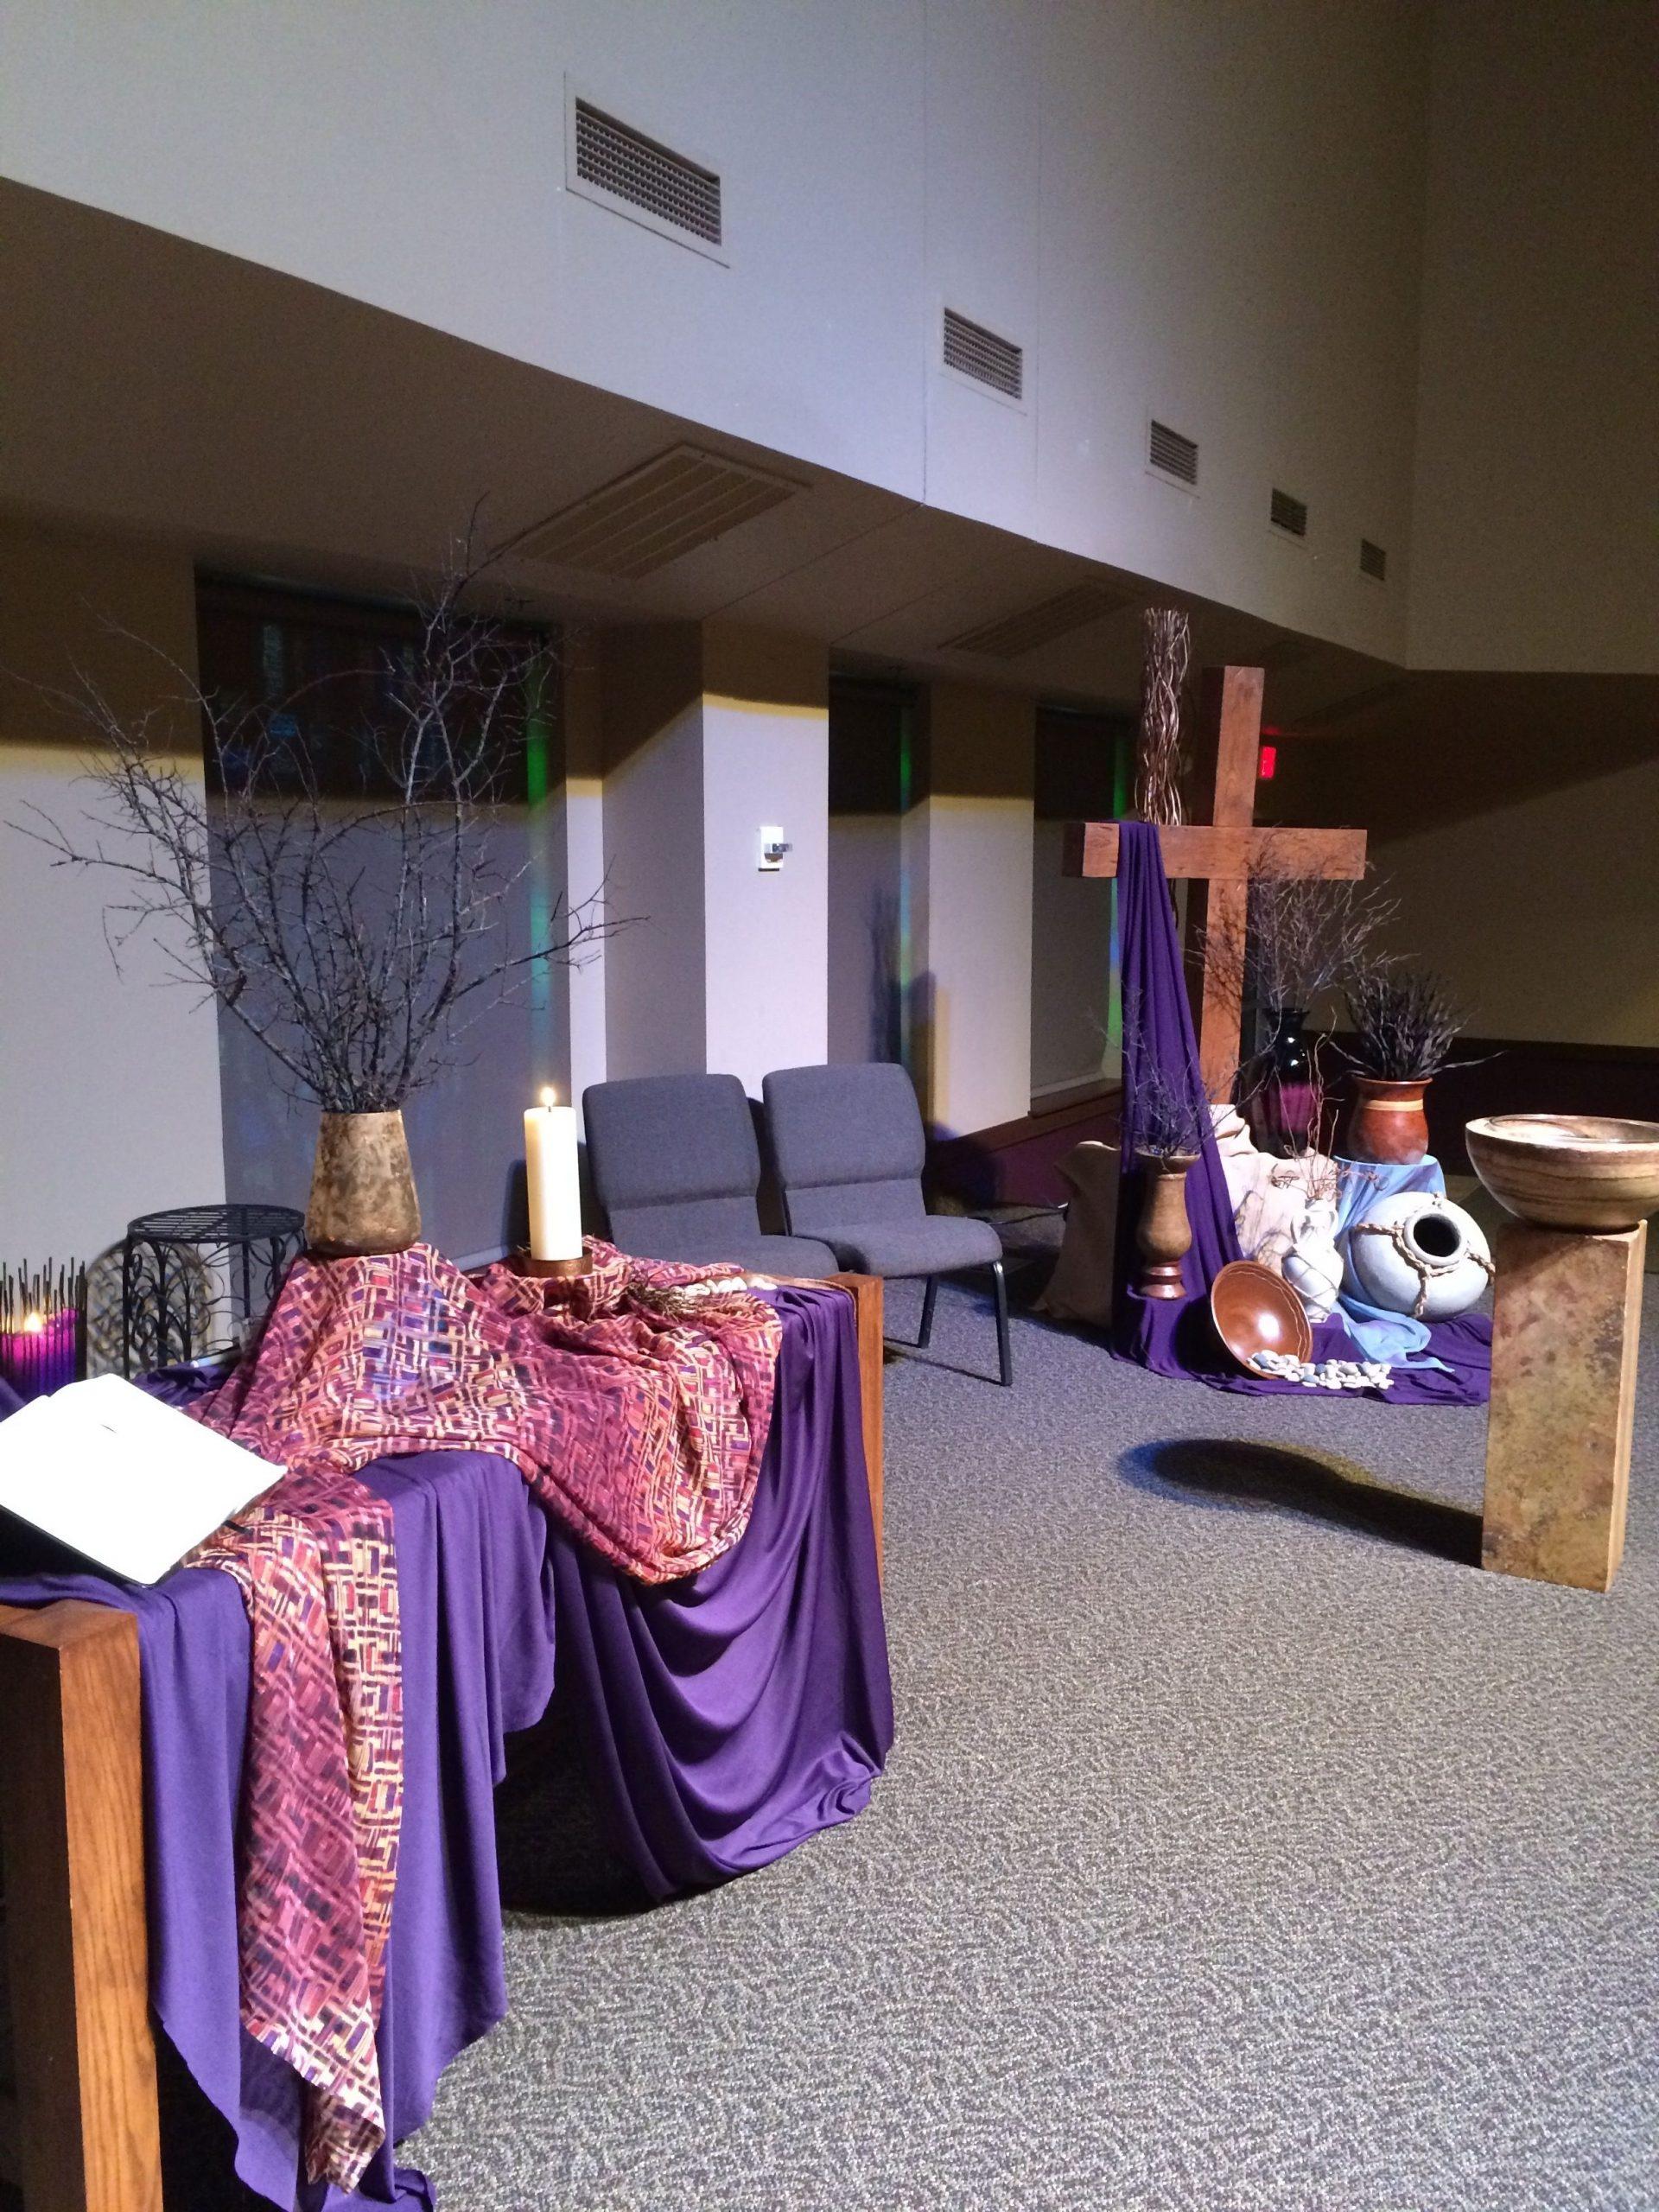 Lent 2015, Grace Avenue Umc - Worship Center   Altar